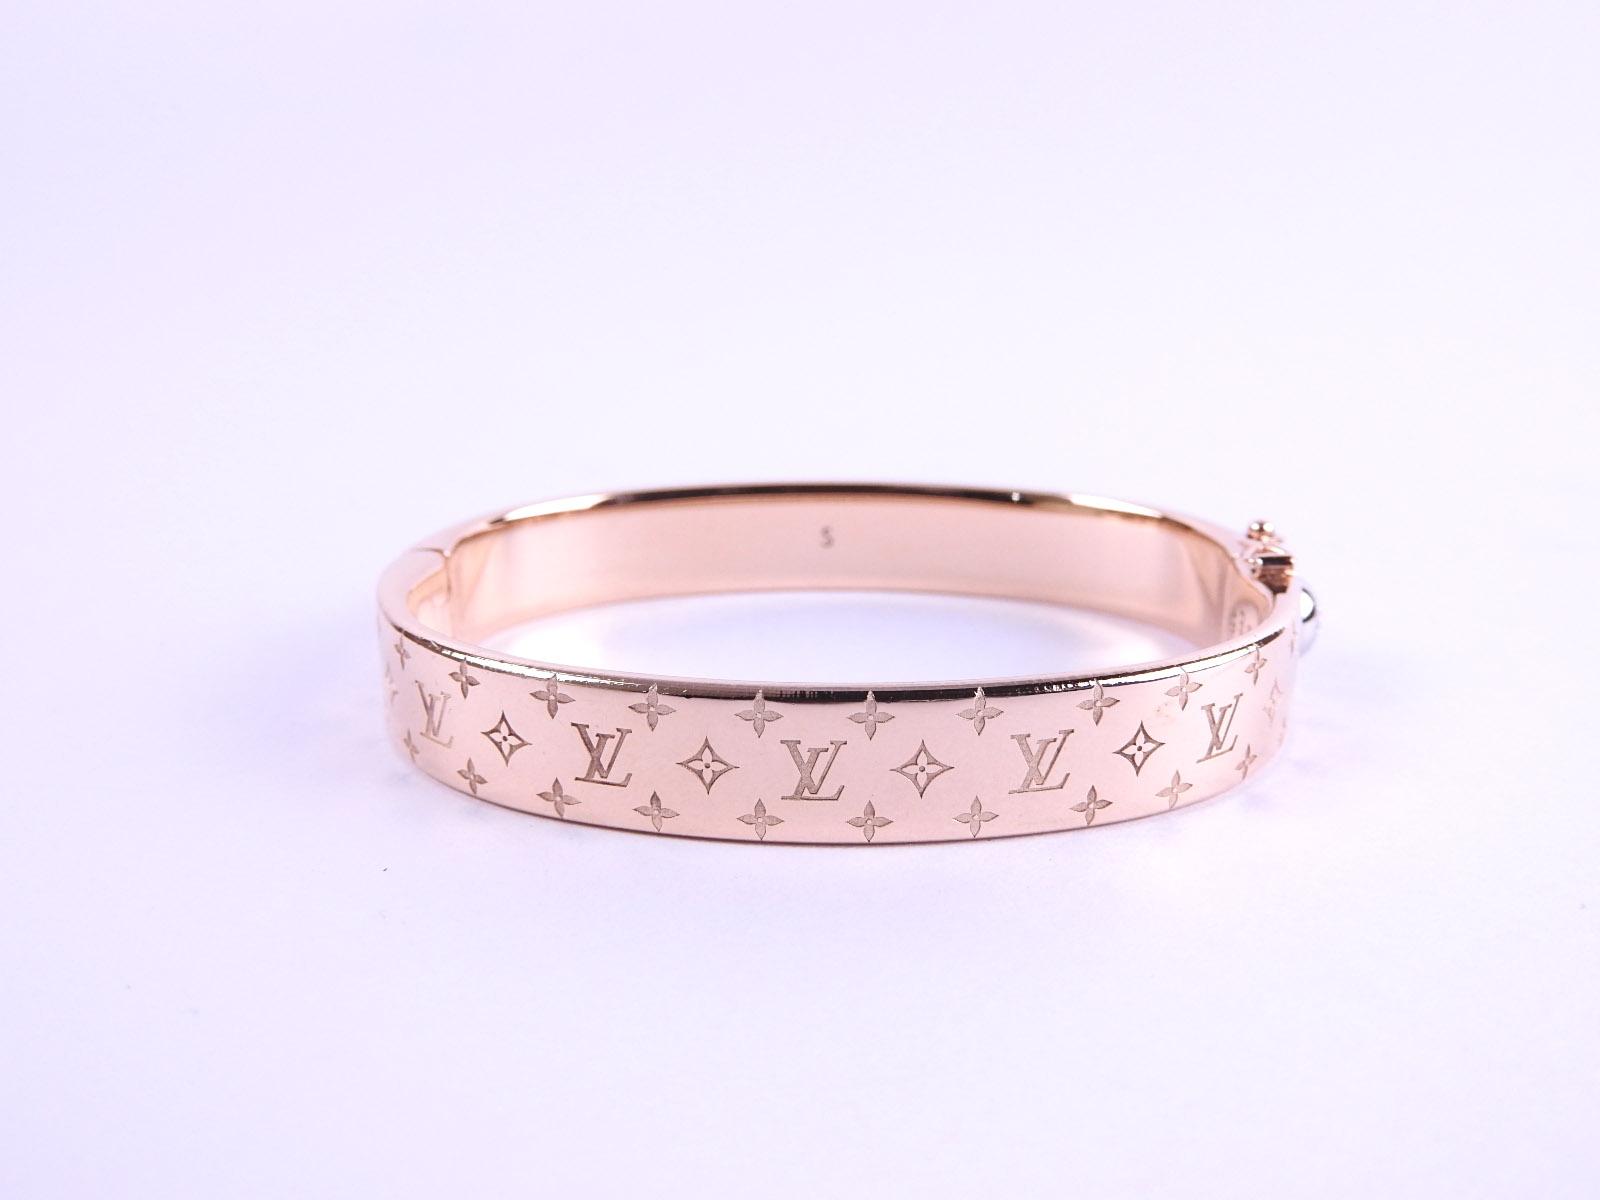 Auth Louis Vuitton Cuff Nanogram Monogram Bangle Bracelet